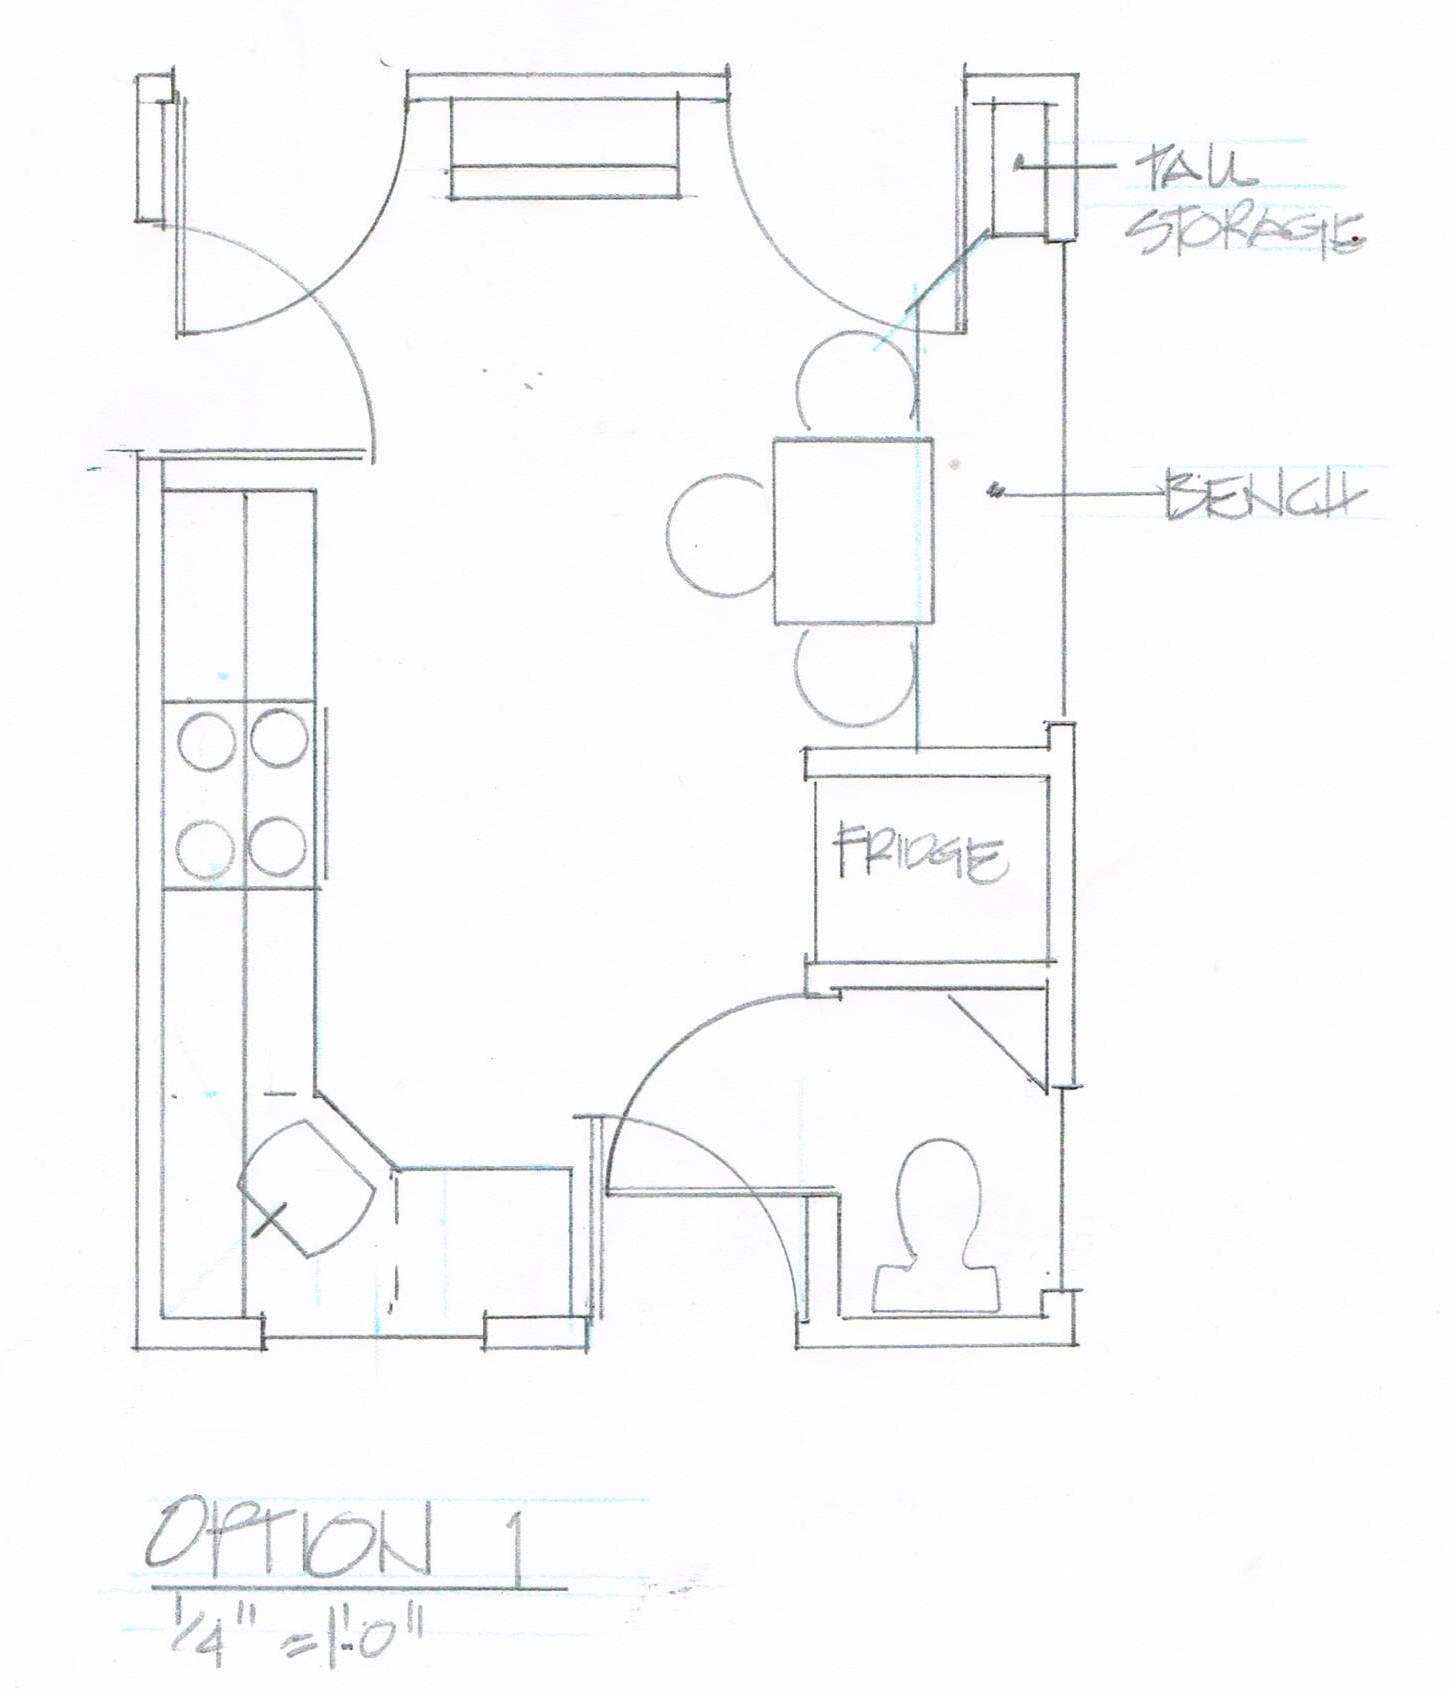 Kitchen Clients Drawing Autocad Archicad Planner Designs Kitchen Layouts Blueprint Portfolio Kitchens Design Ideas The Philosophy Of Online Kitchen Layout (View 19 of 31)